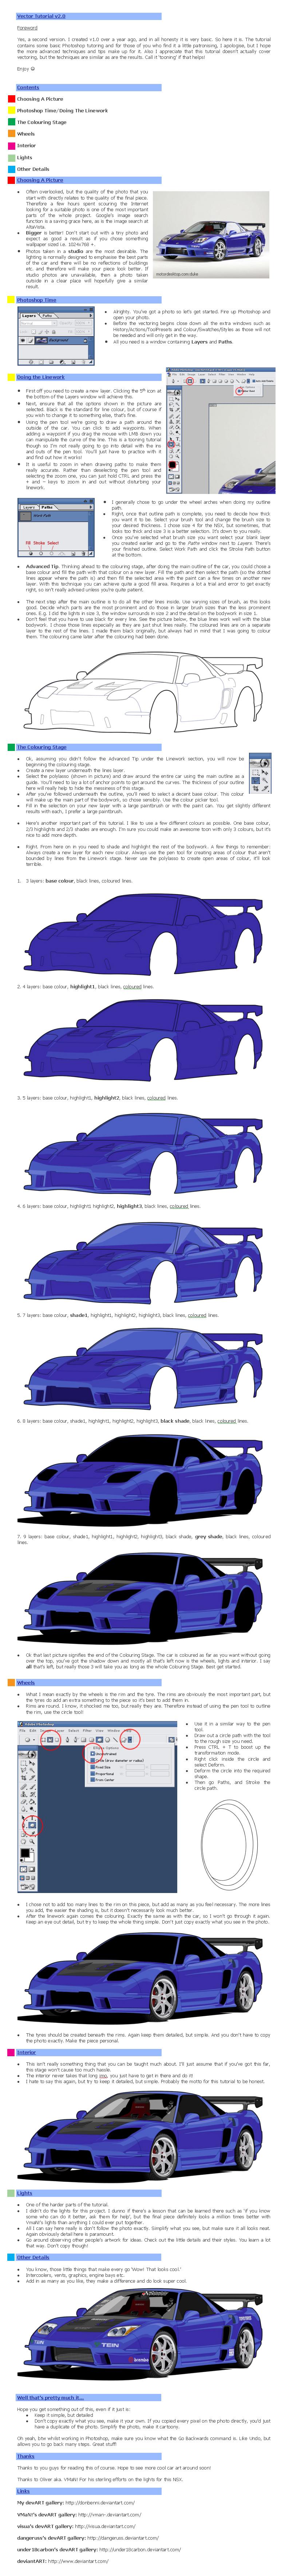 Vector Tutorial v2 by donbenni